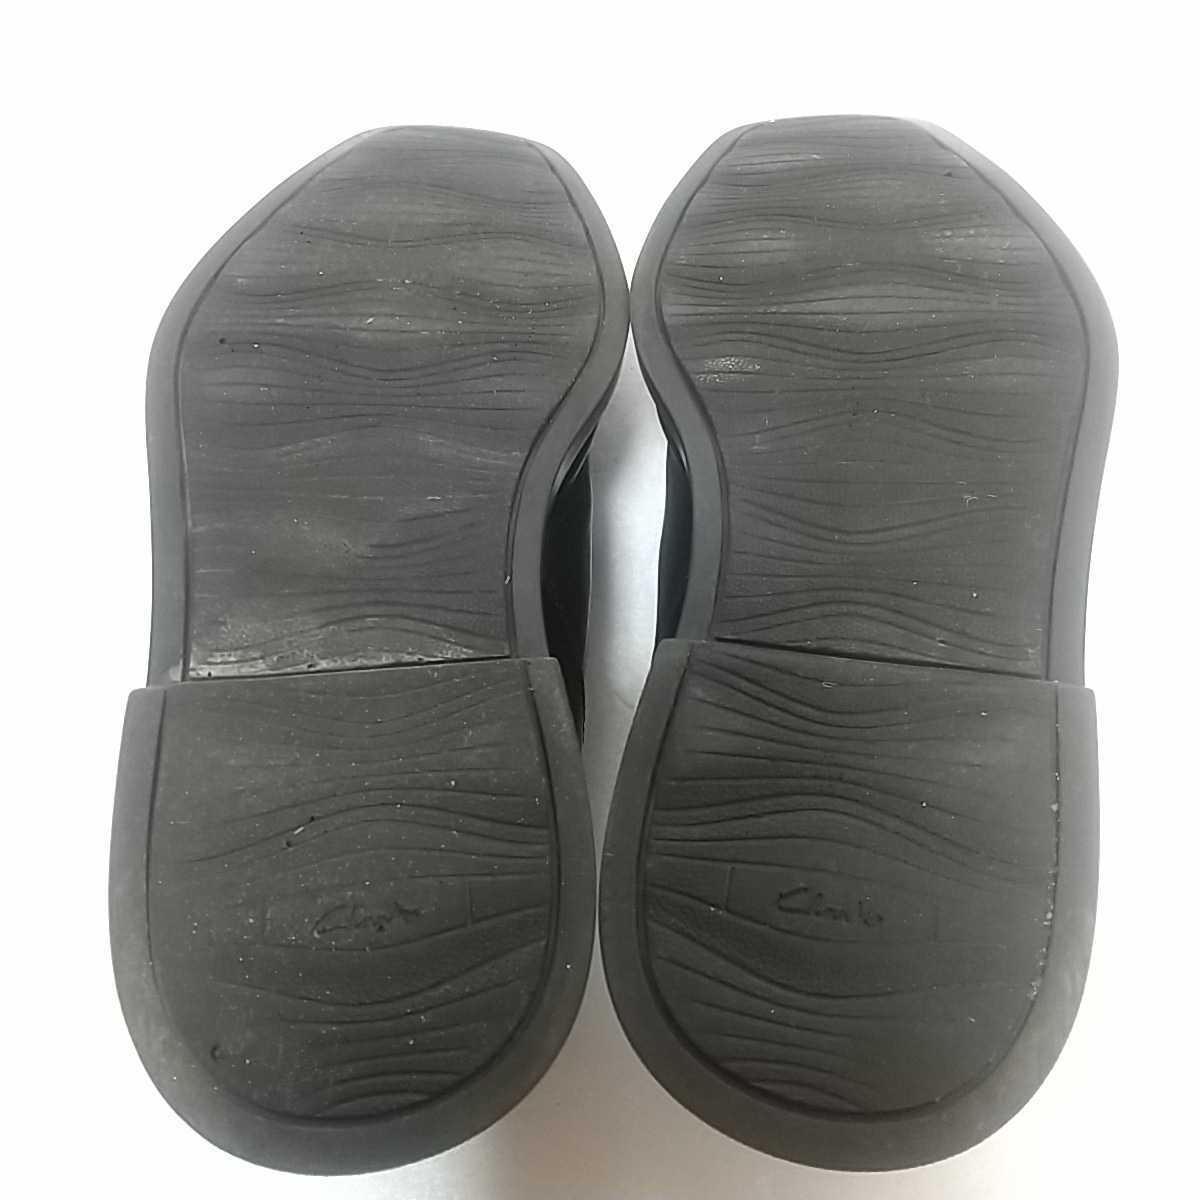 Clarks クラークス レザー サイドゴアブーツ ショート UK9 27.5cm 黒 ブラック 革靴 _画像9